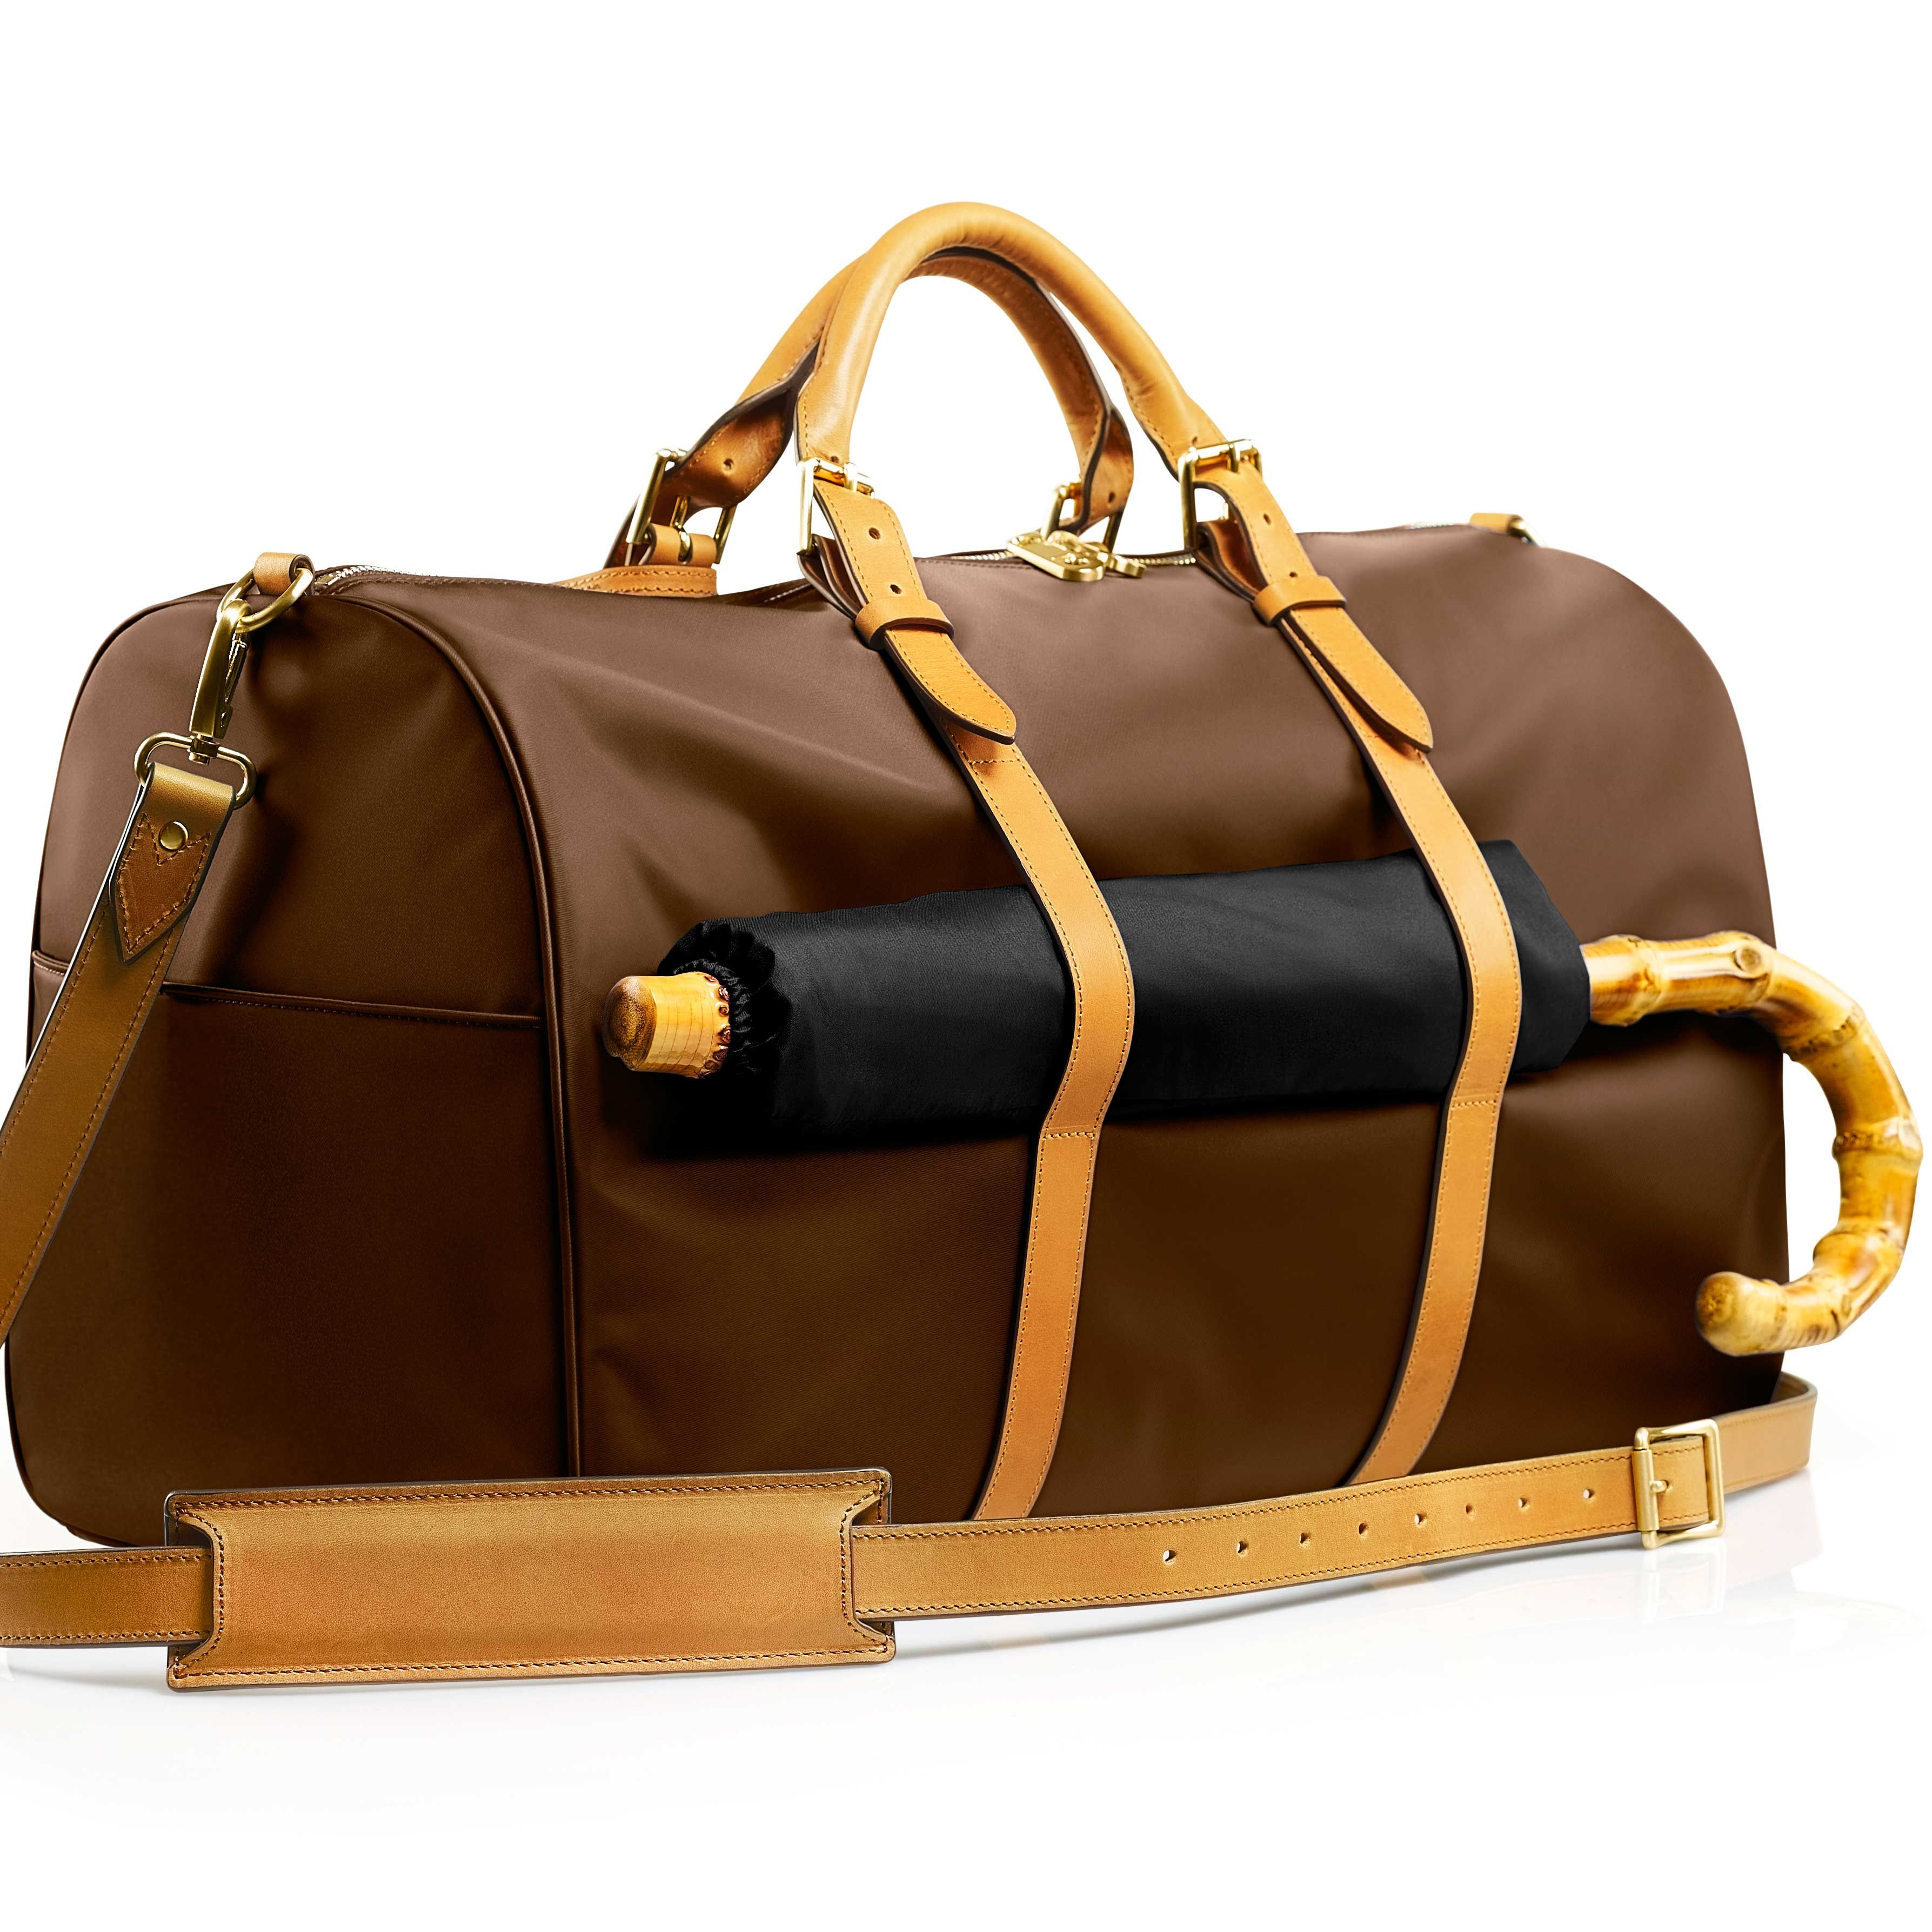 102eff14a5 Herschel Gym Bag Uk